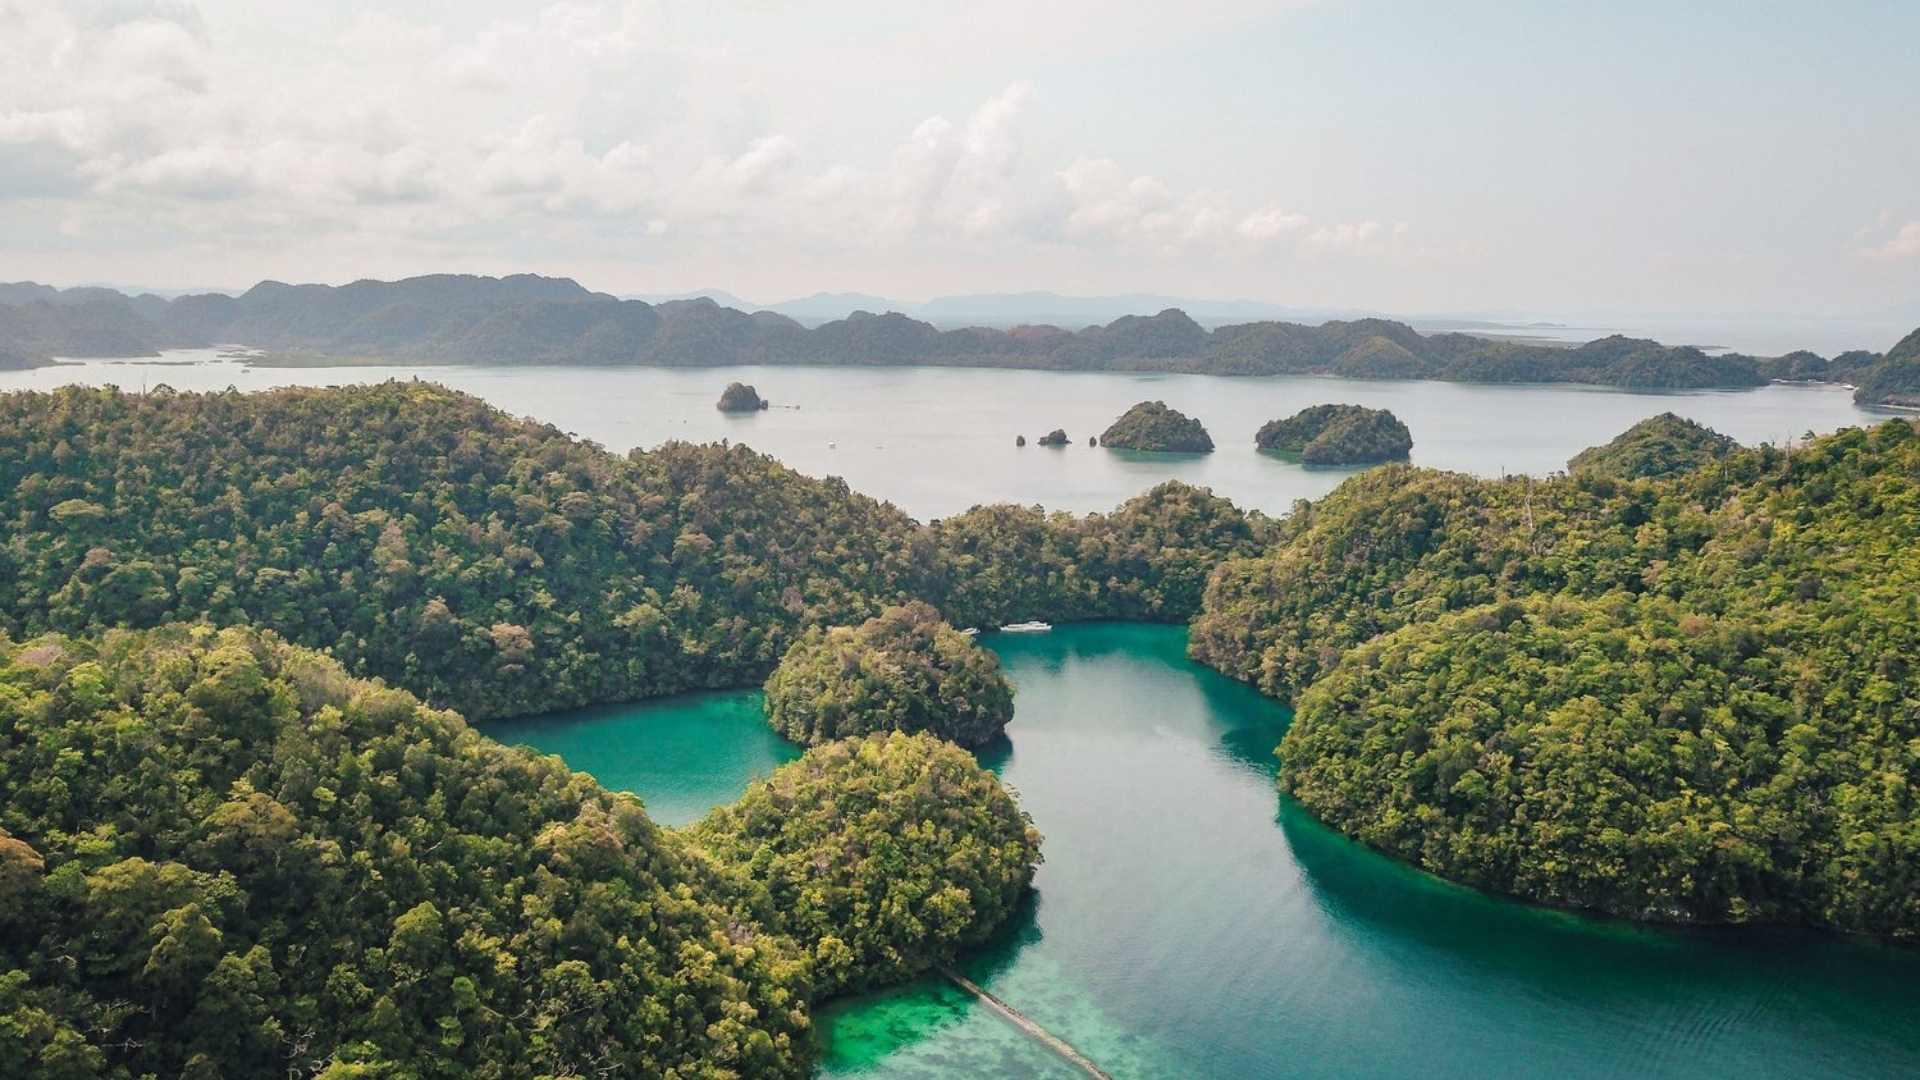 Siargao Island, the Philippines - beautiful islands